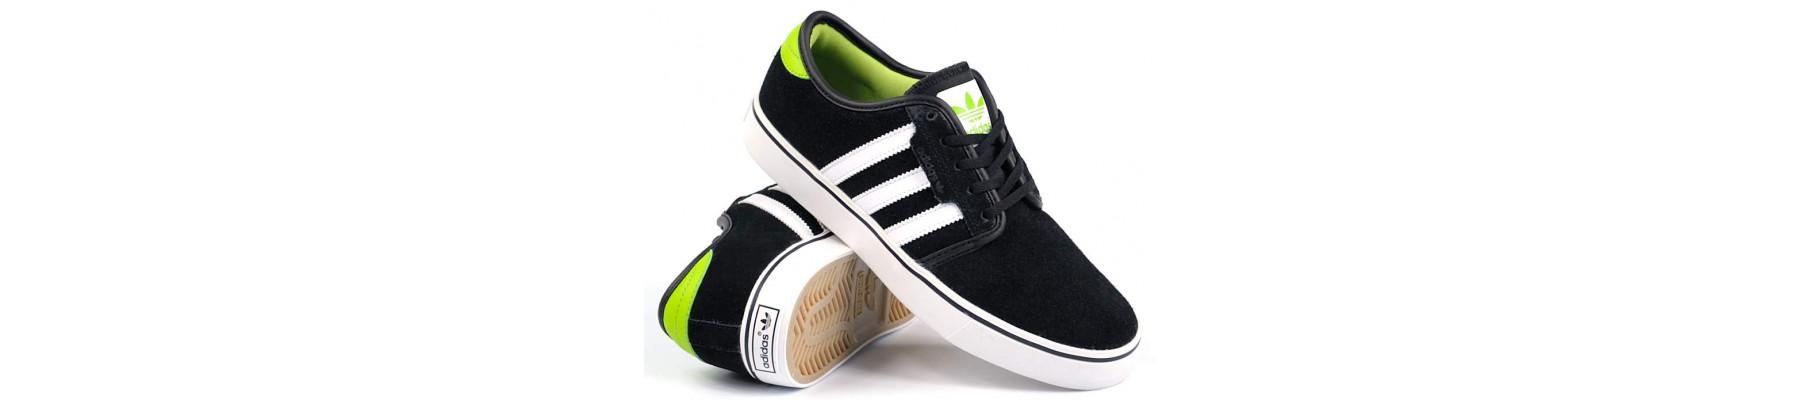 Adidas Skateboarding Seeley Blk suede